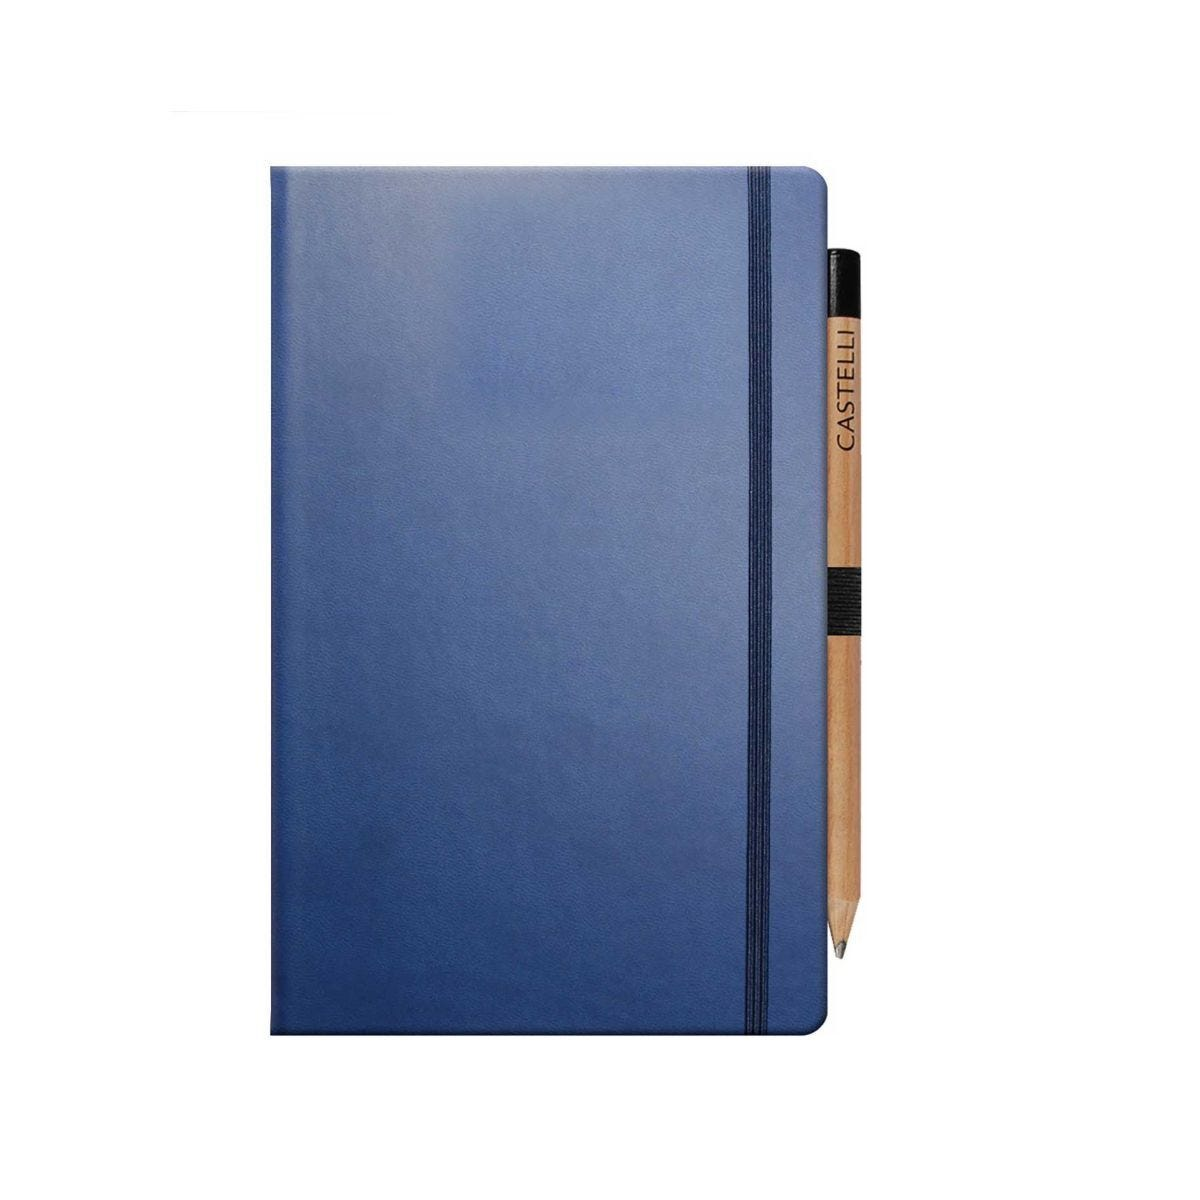 Castelli Ivory Tuscan Notebook Medium Ruled Plus Pencil China Blue